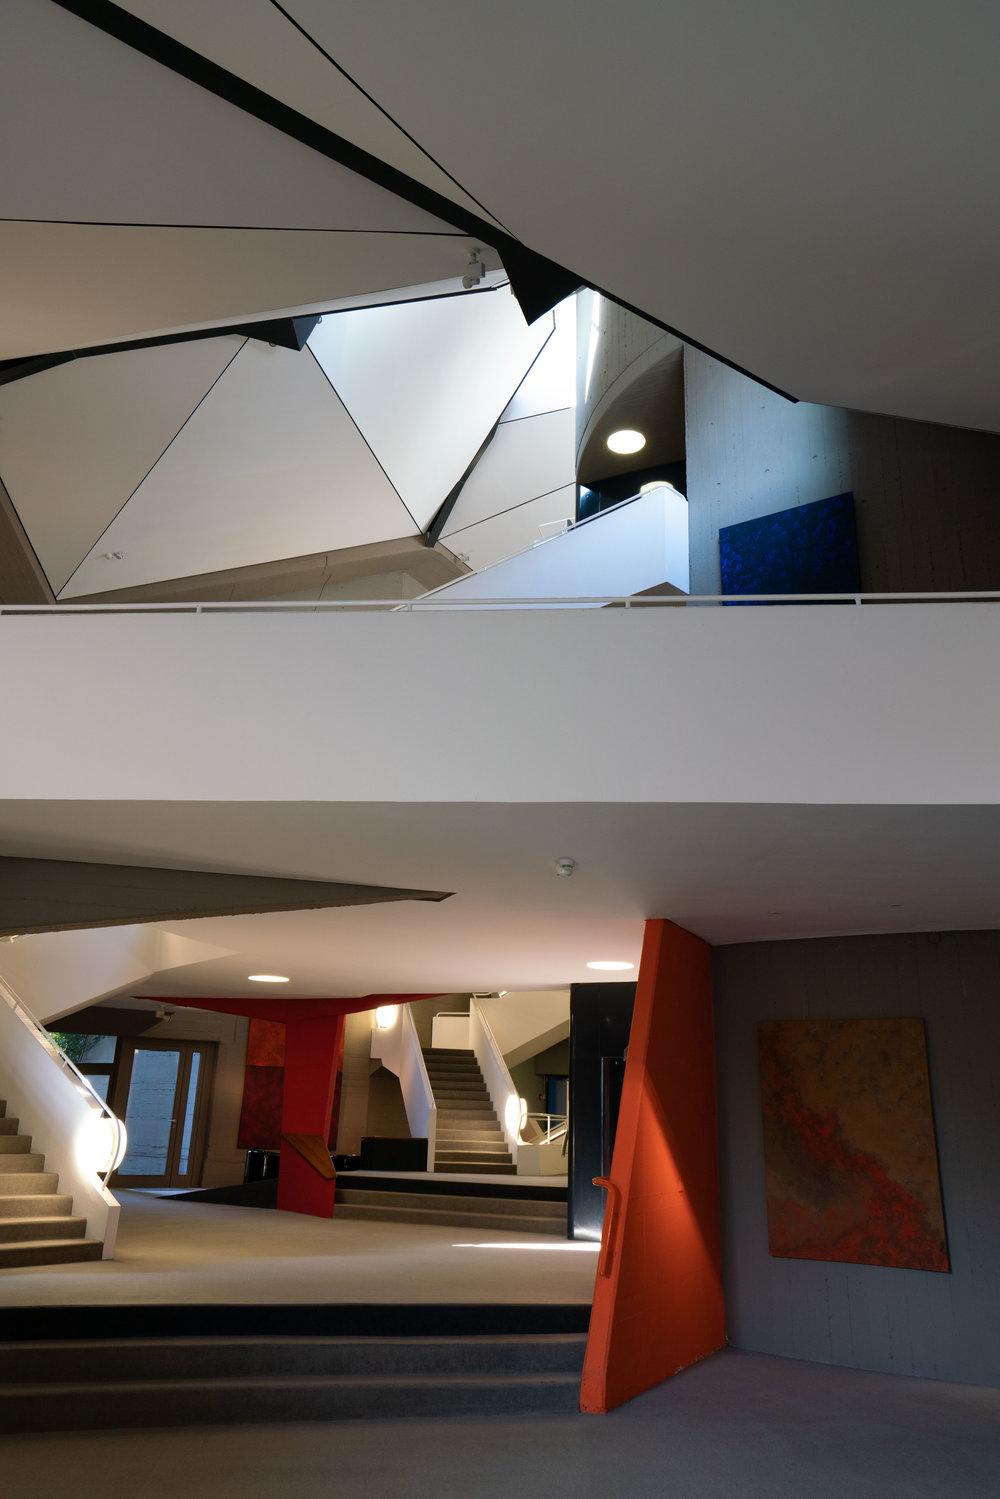 181012_Fehling+Gogel, Max Planck Institute_42.jpg